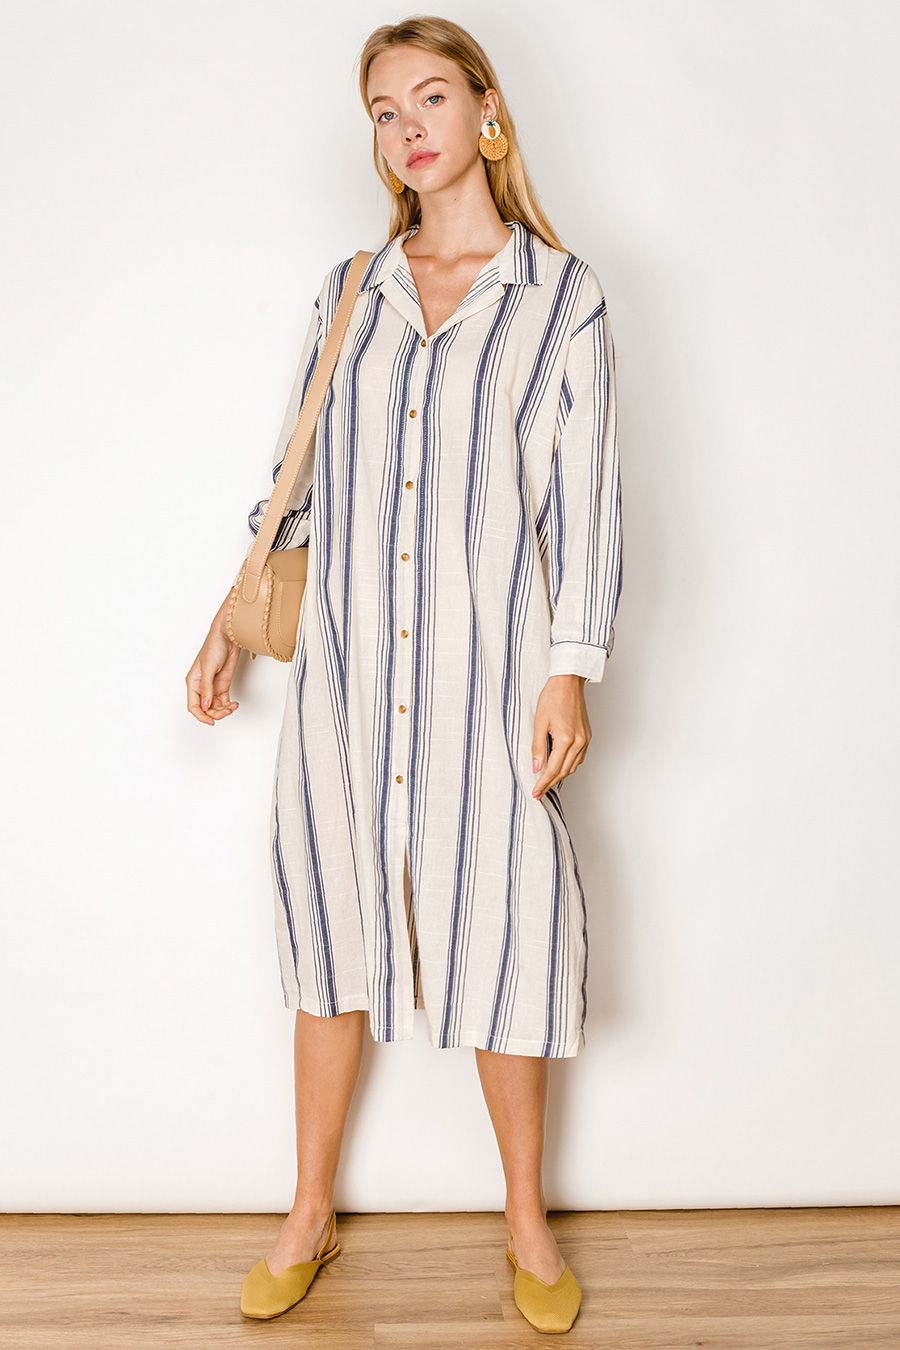 CHARLEE DRESS - BISCOTTI STRIPE